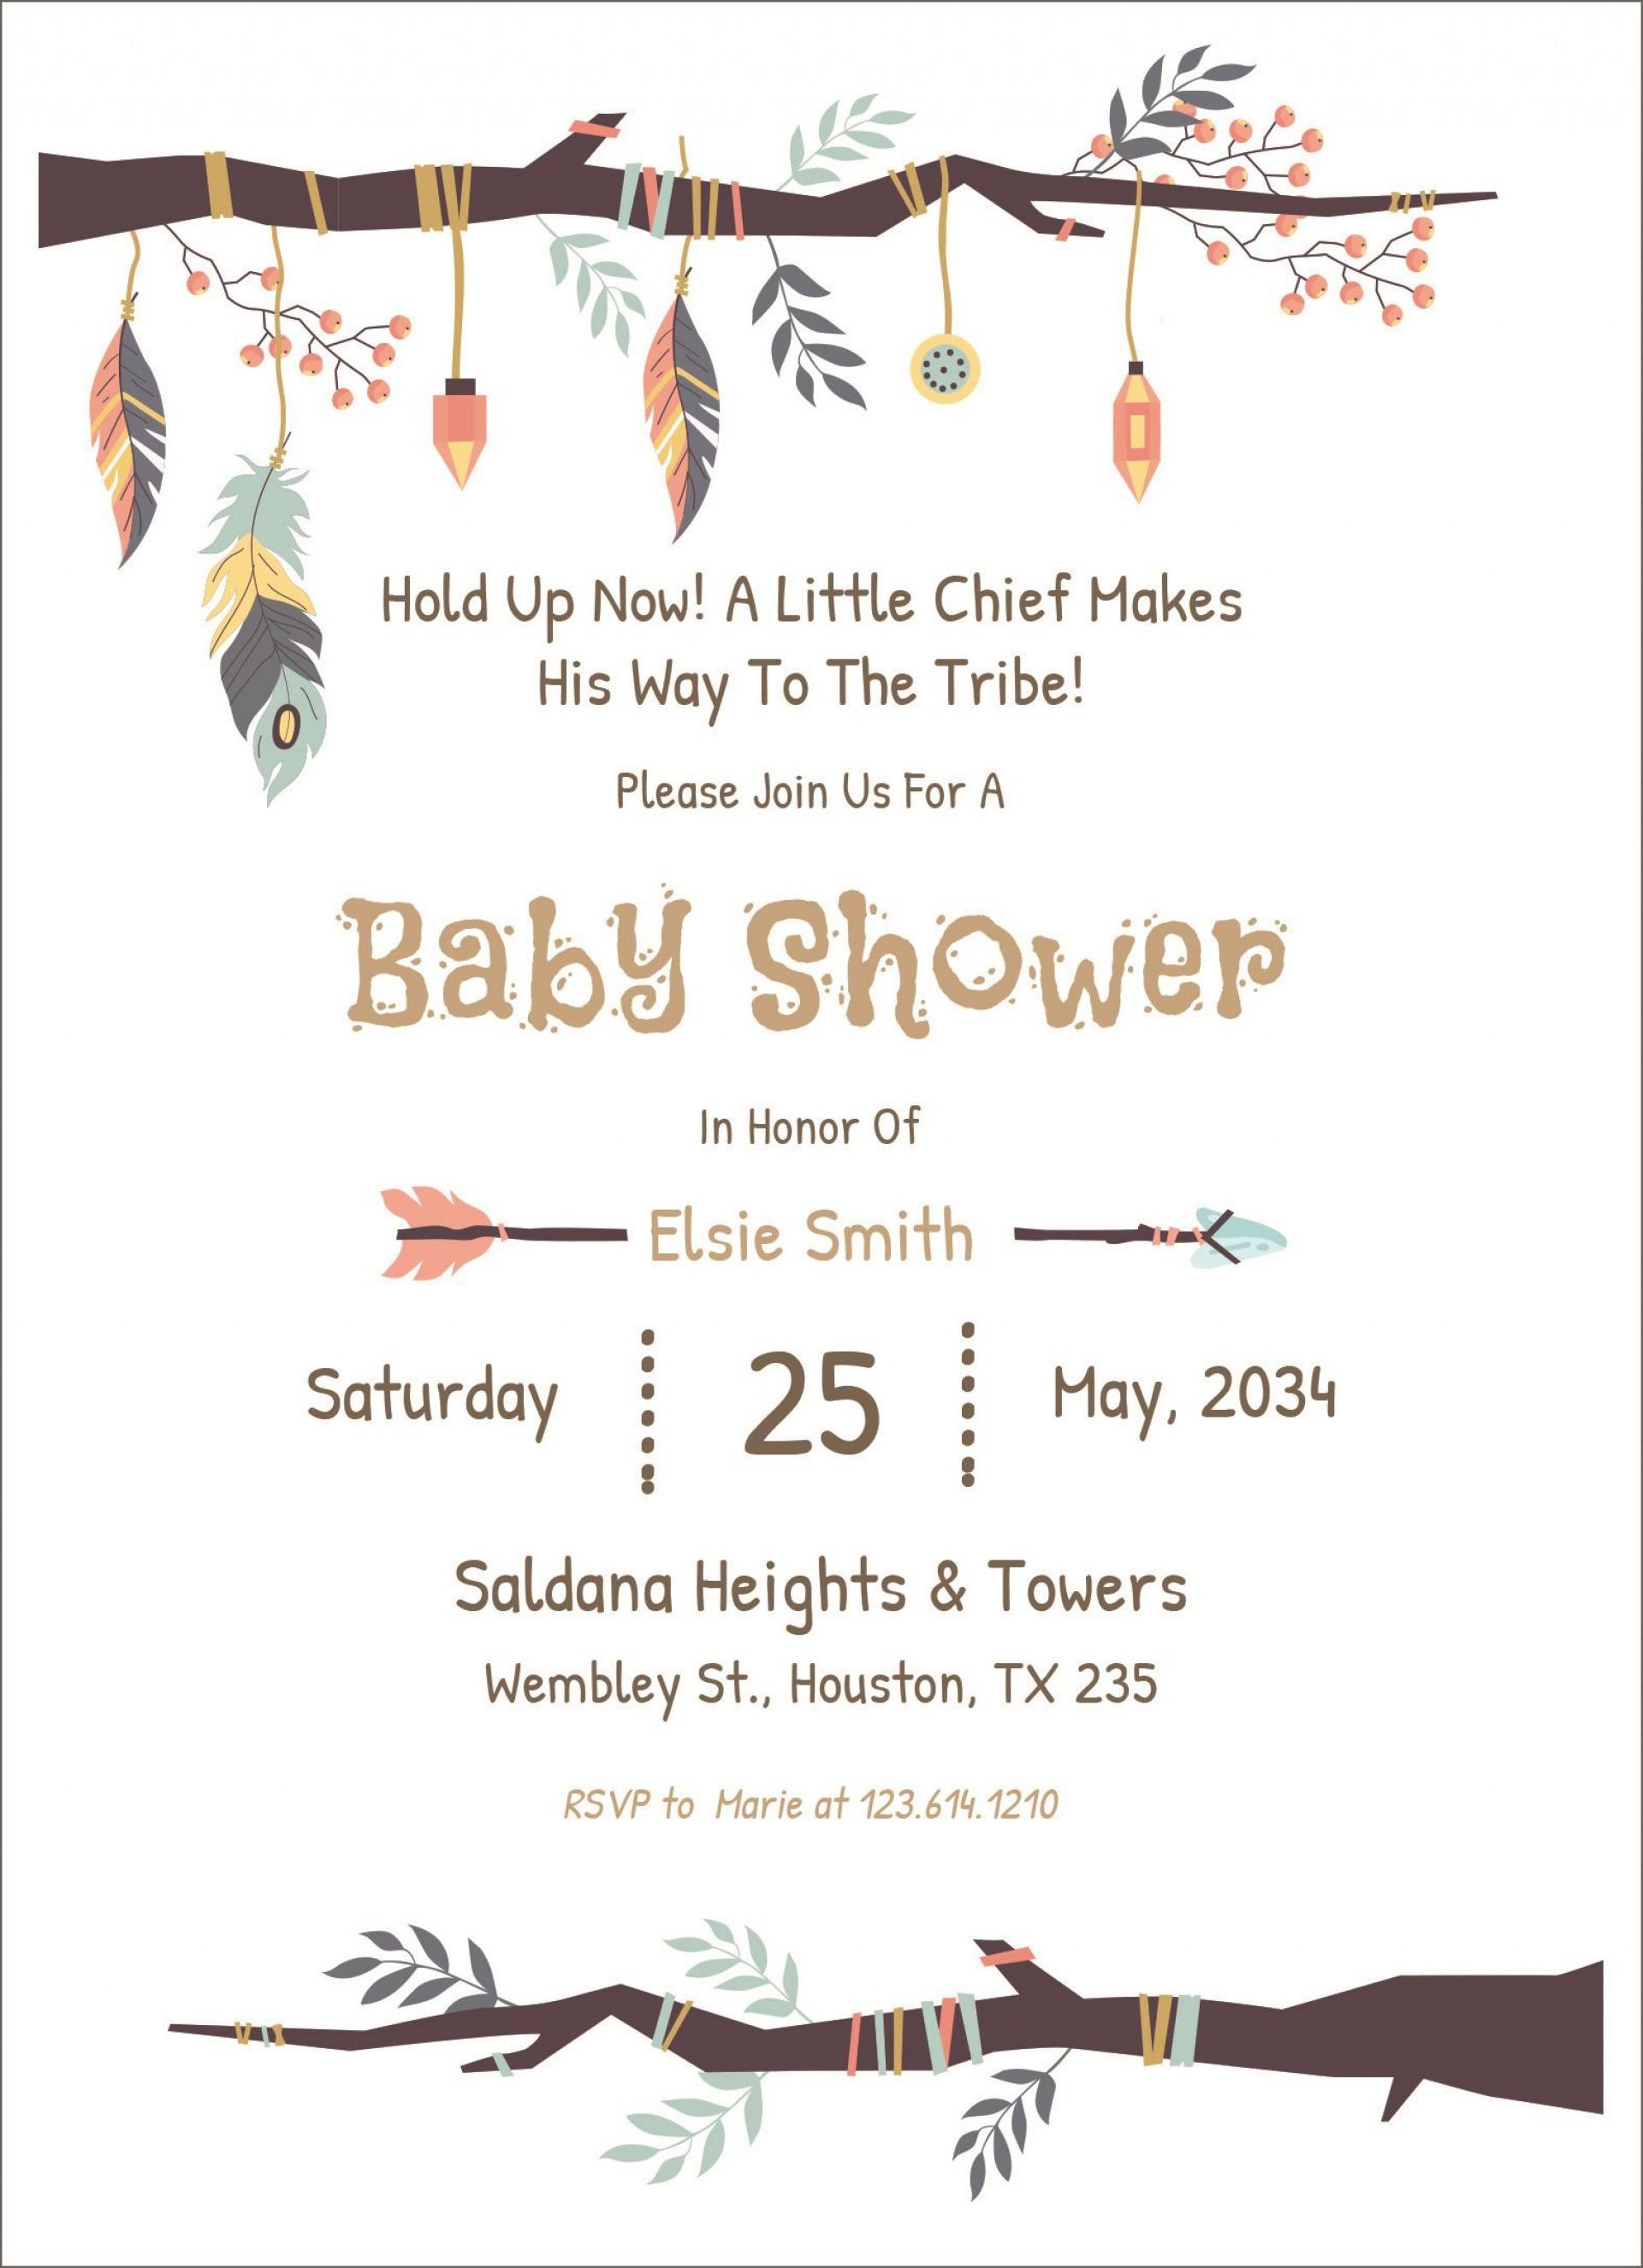 004 Unforgettable Microsoft Word Invitation Template Baby Shower Sample  Free Editable Invite1920